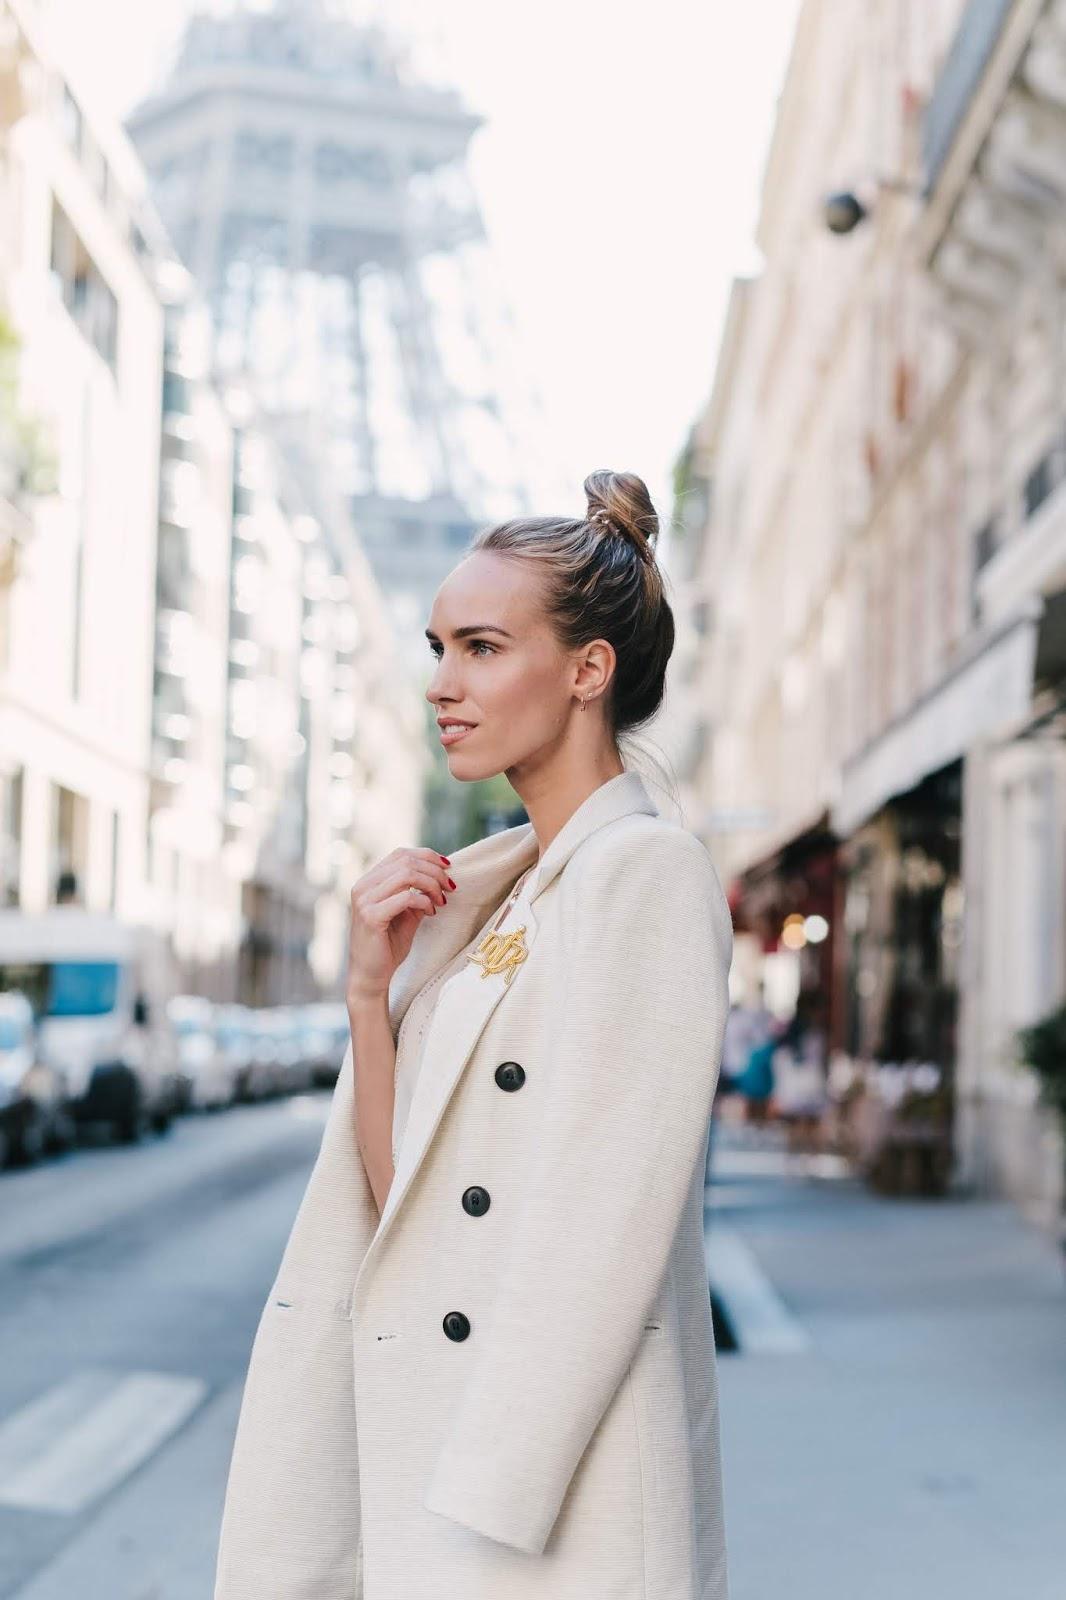 parisian street style outfit summer white blazer eiffel tower